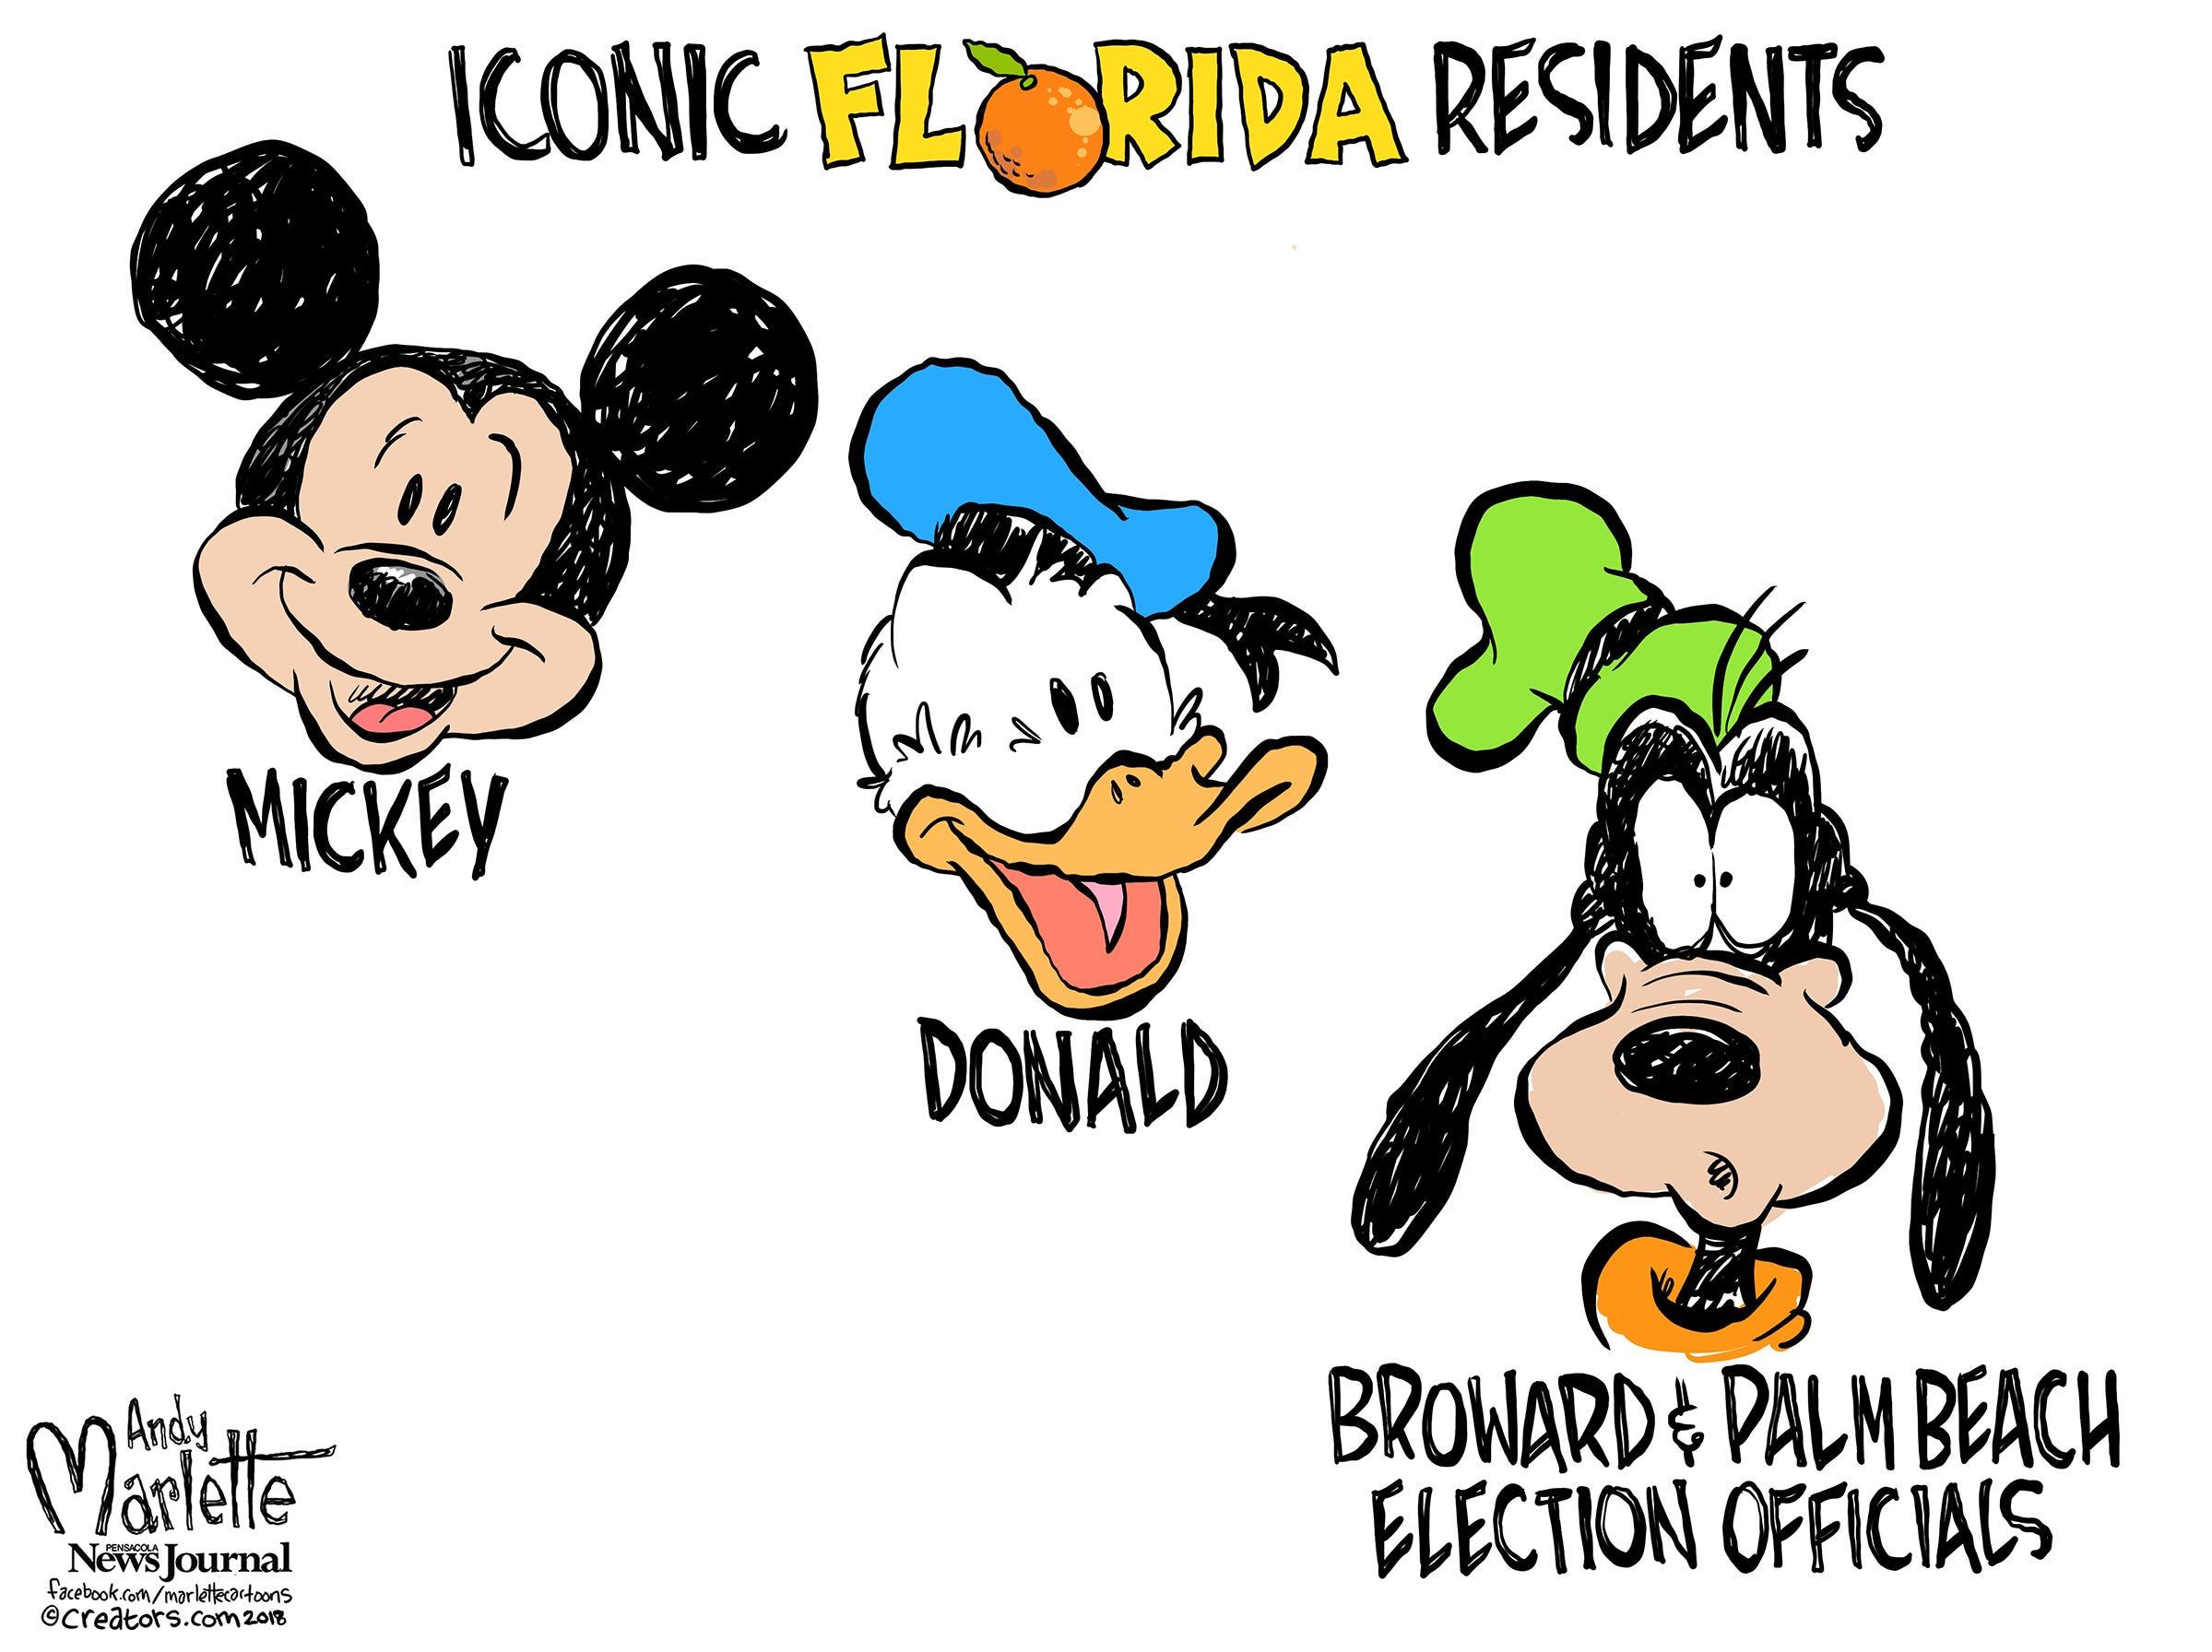 Marlette's Florida Election Cartoons